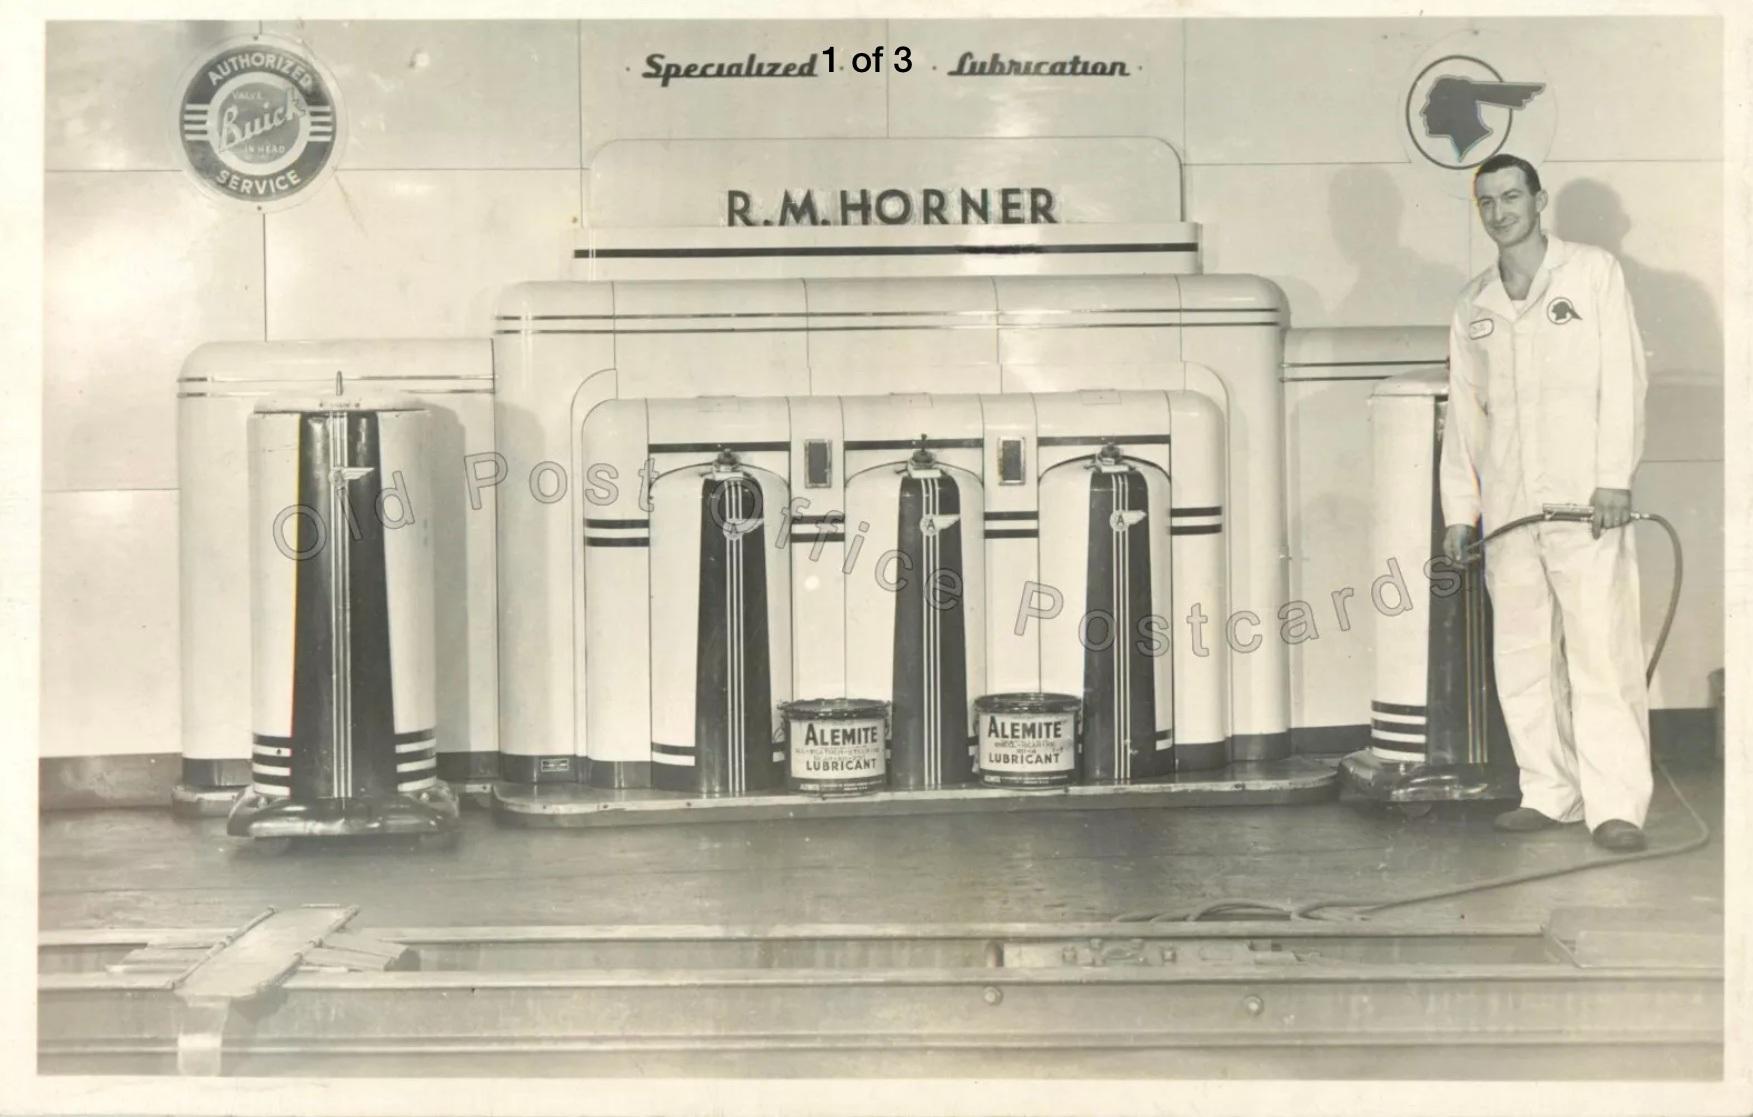 1939 Alemiter & mechanic